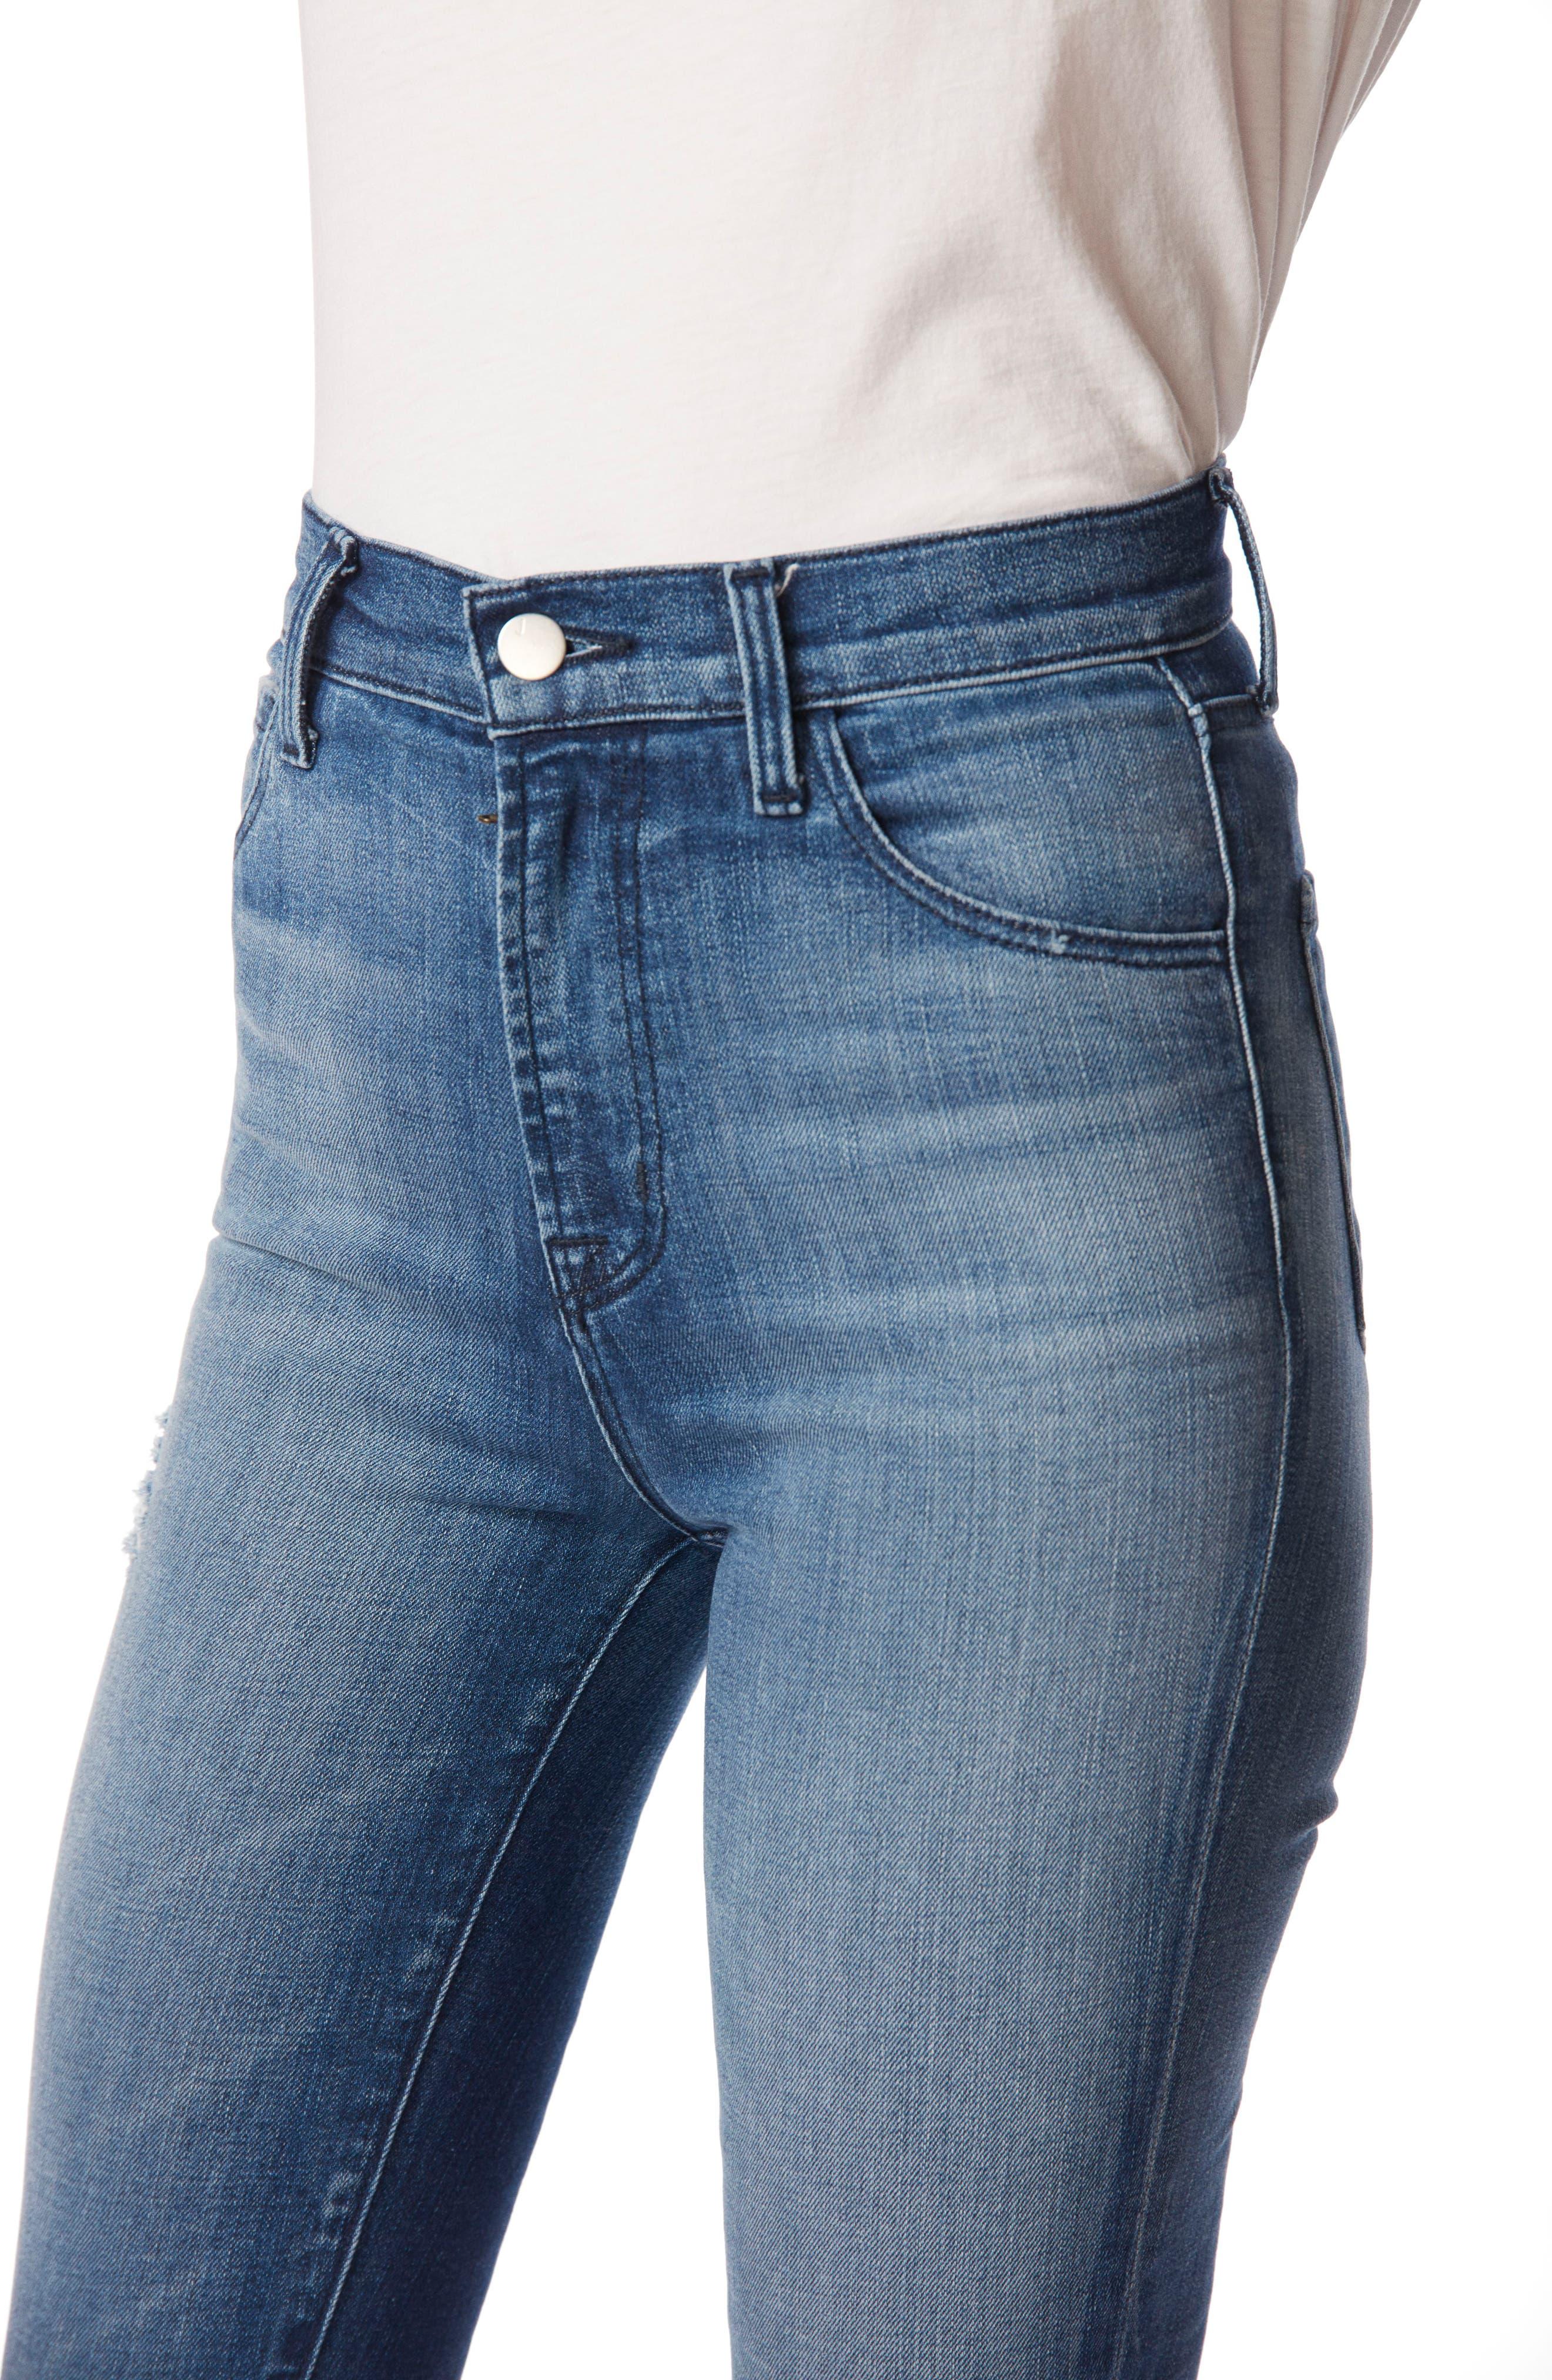 Carolina Super High Waist Skinny Jeans,                             Alternate thumbnail 4, color,                             Mystic